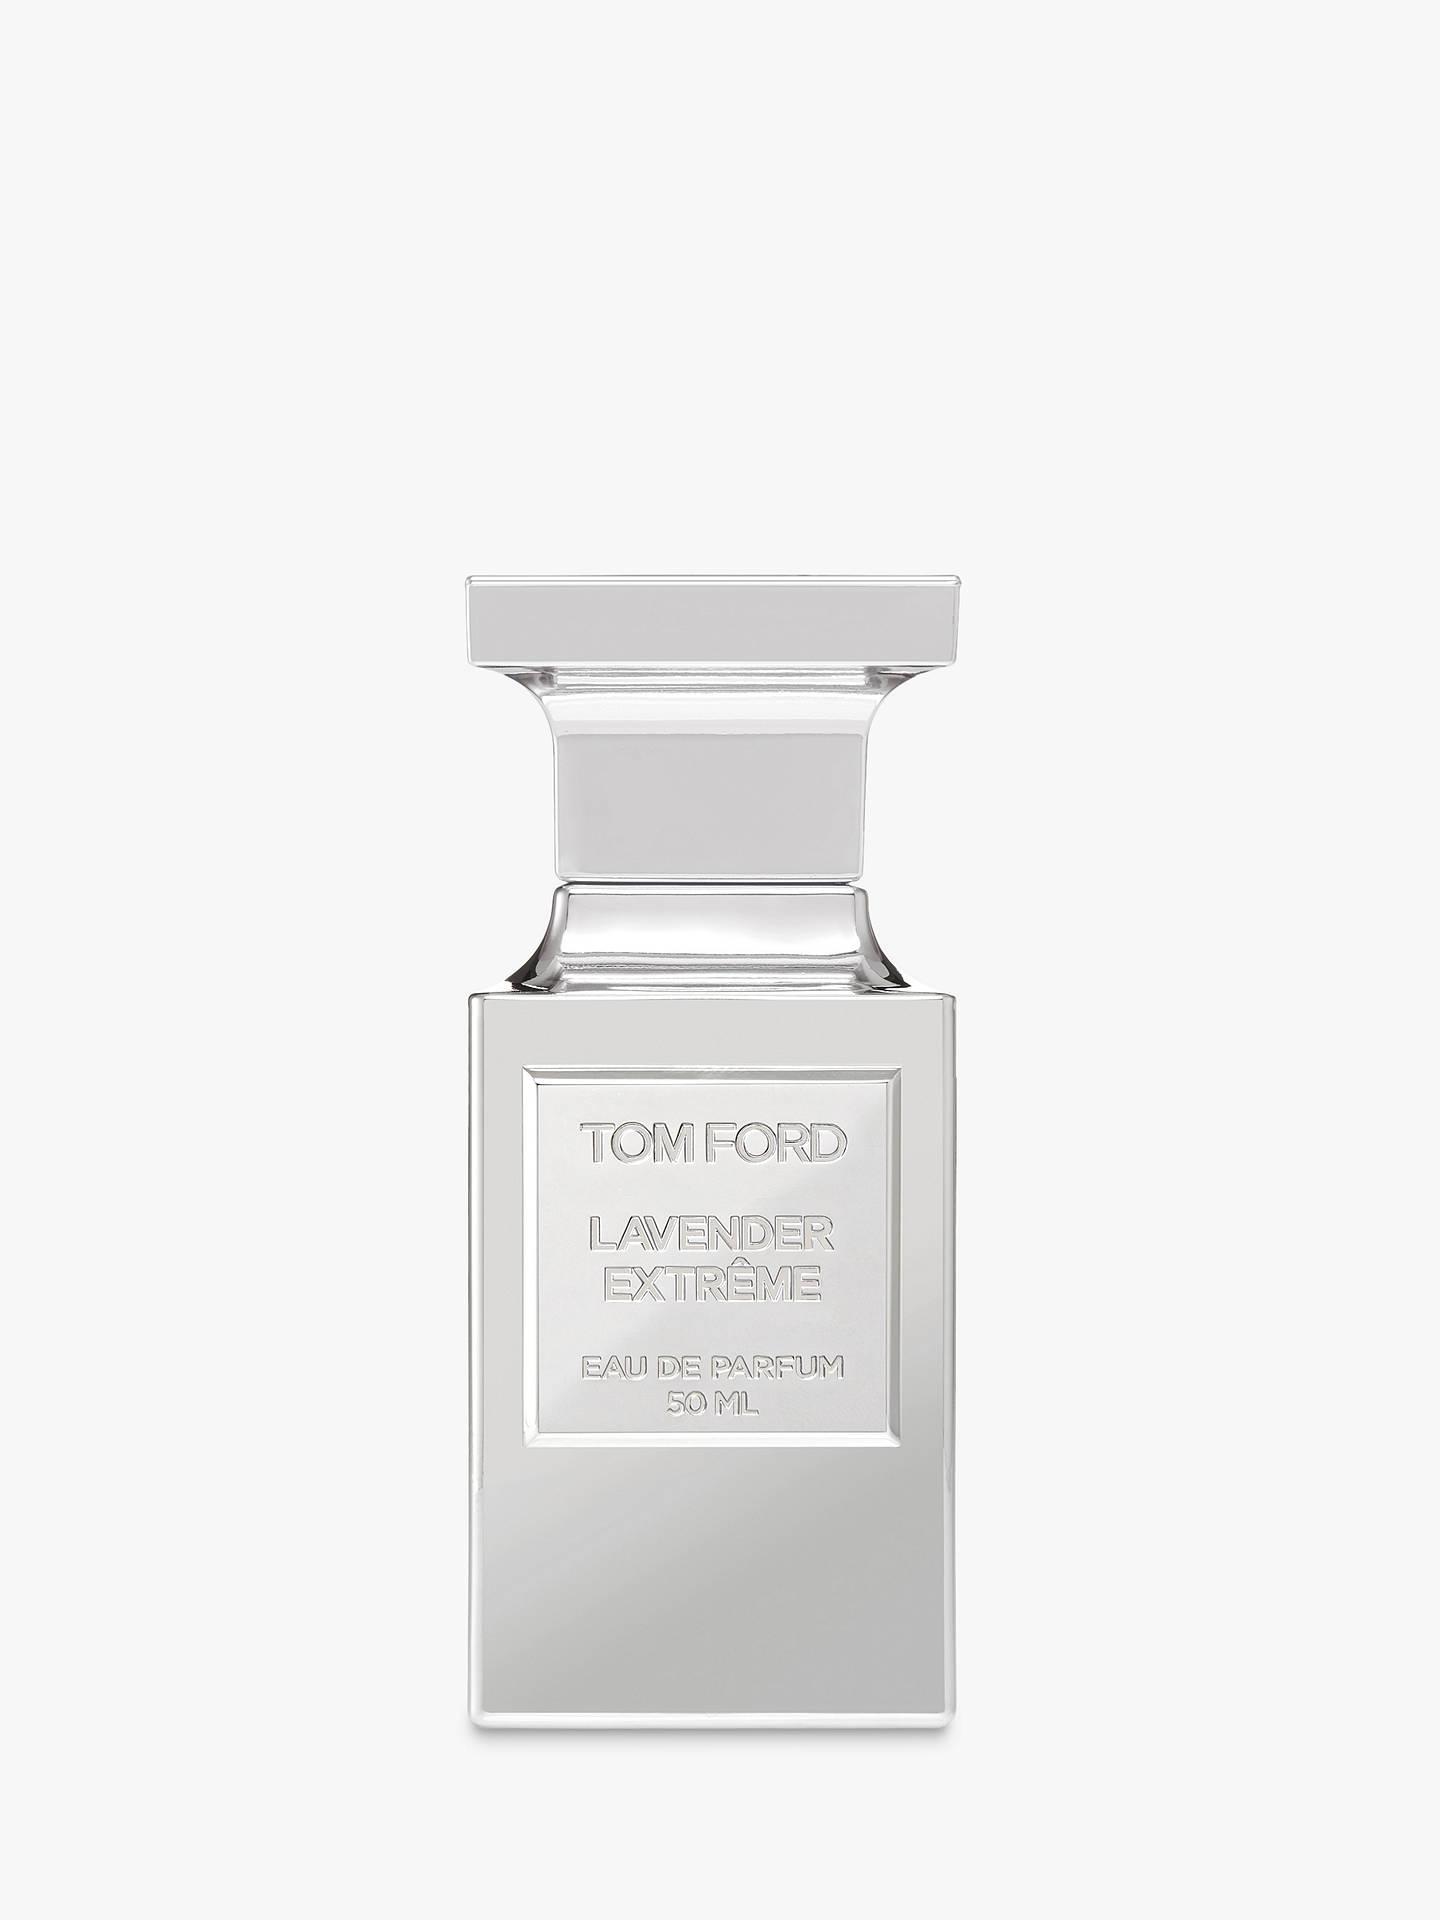 Blend Private Tom Extrême Eau Ford De Lavender Parfum50ml H2E9DI